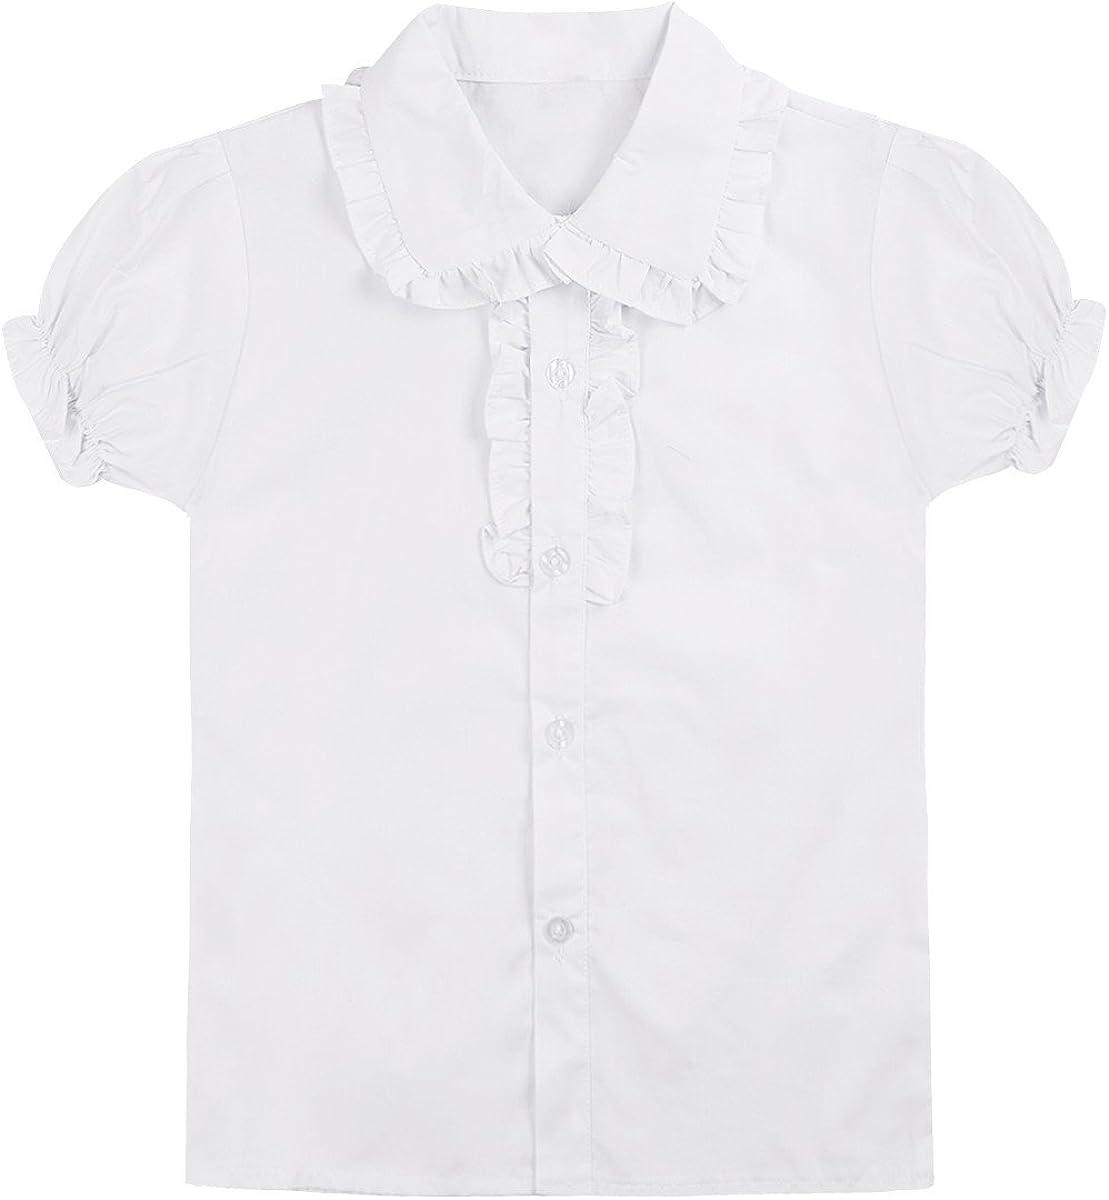 Freebily Teens Boys Girls White Long/Short Sleeve School Uniform Shirt Tops Spread Collar Blouse